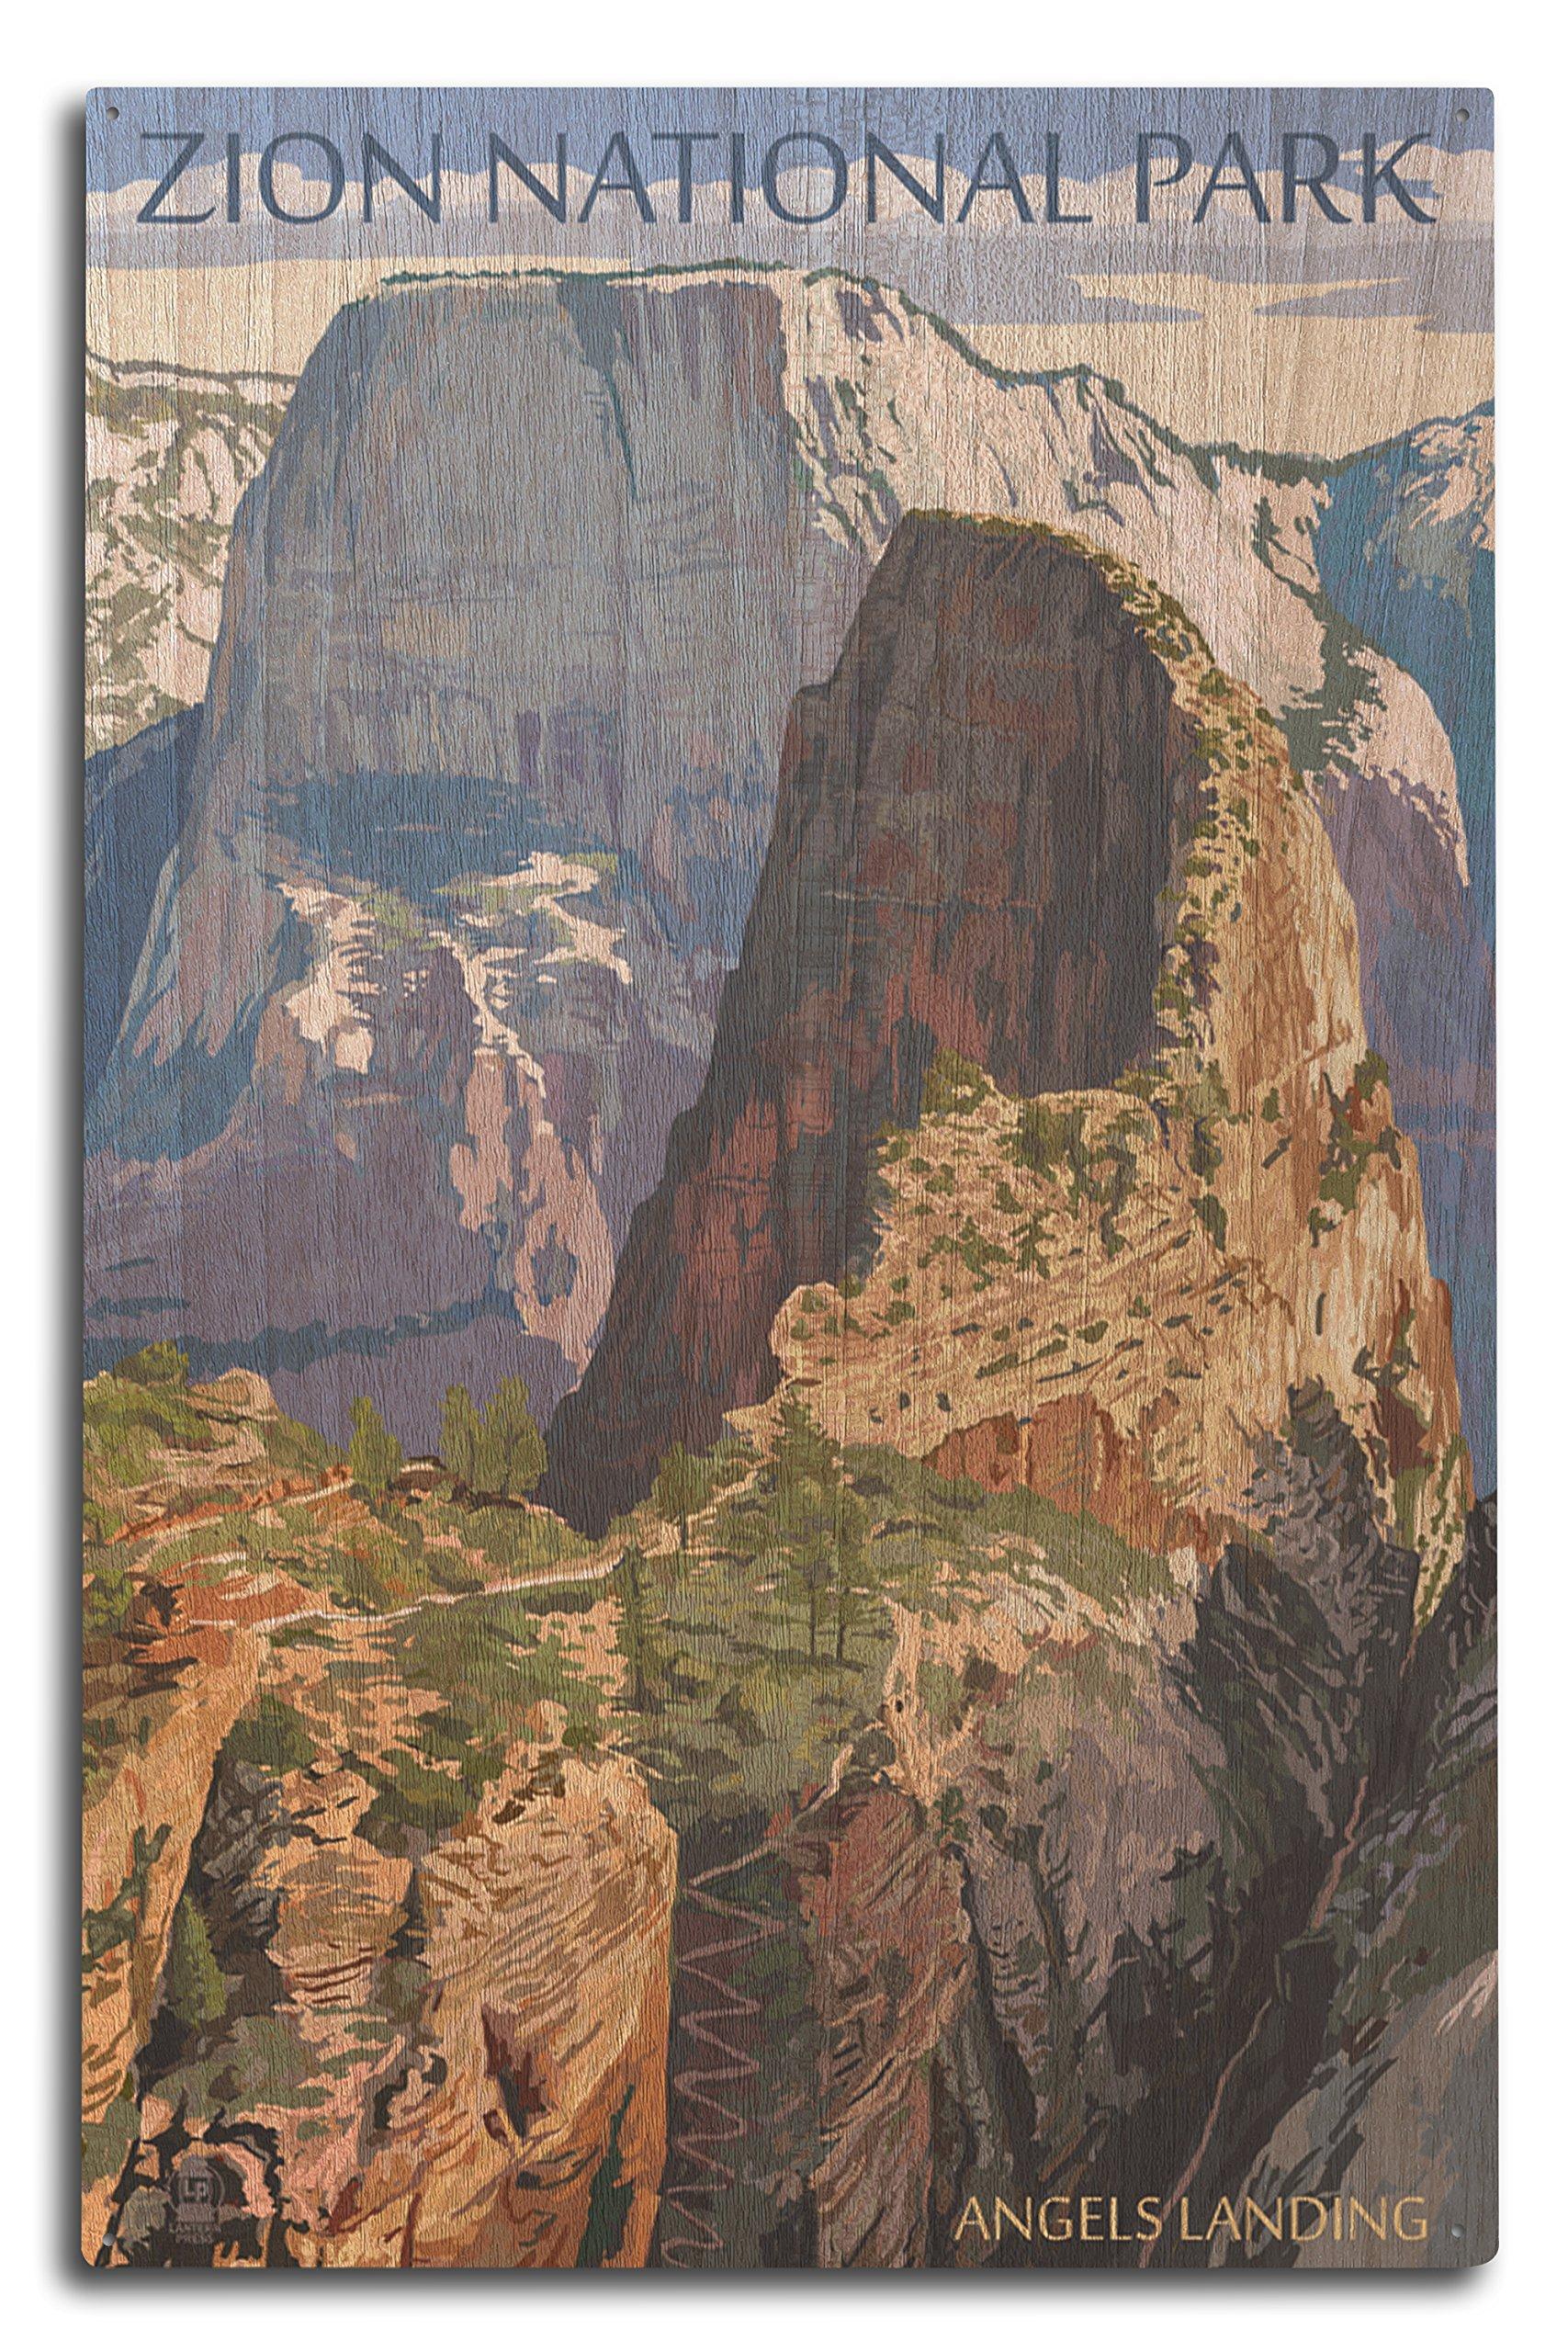 Zion National Park, Utah - Angels Landing (10x15 Wood Wall Sign, Wall Decor Ready to Hang)